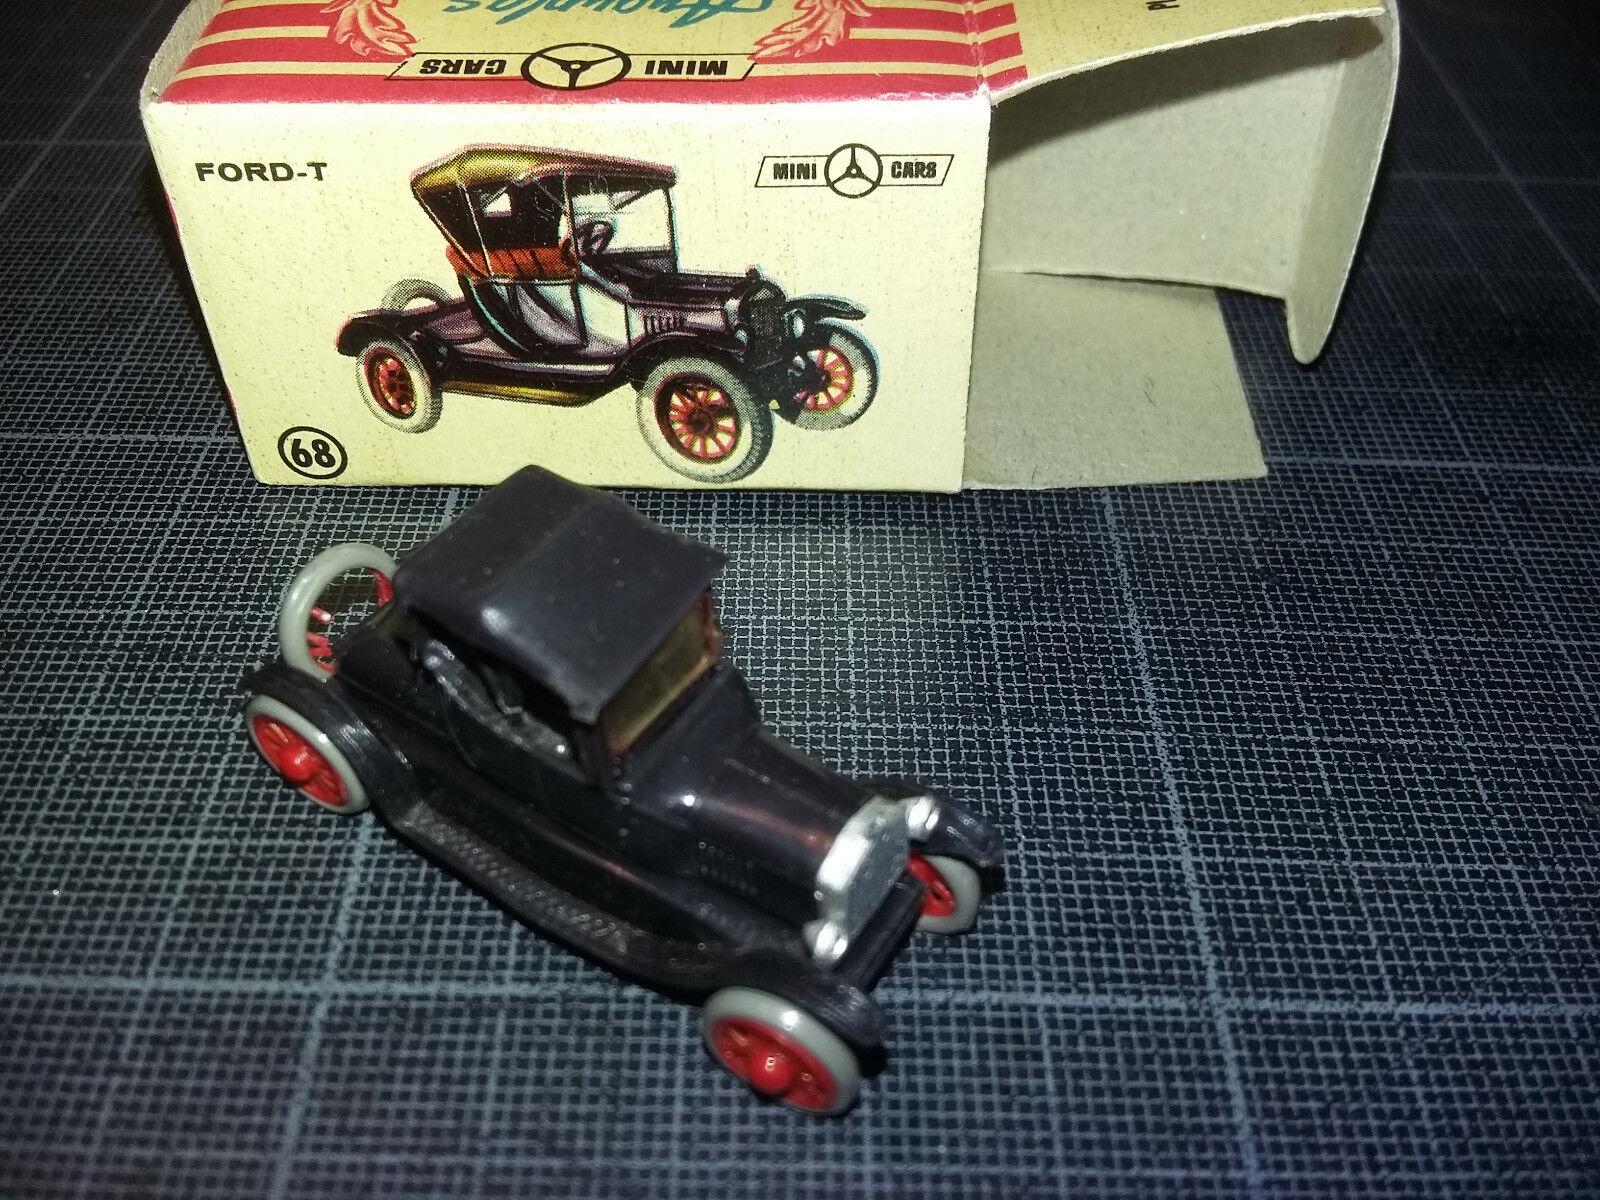 ANGUPLAS MINI CAR HO 1 87 1 86 FORD T NOIRE 1916 BOXED BOITE TBE N°68